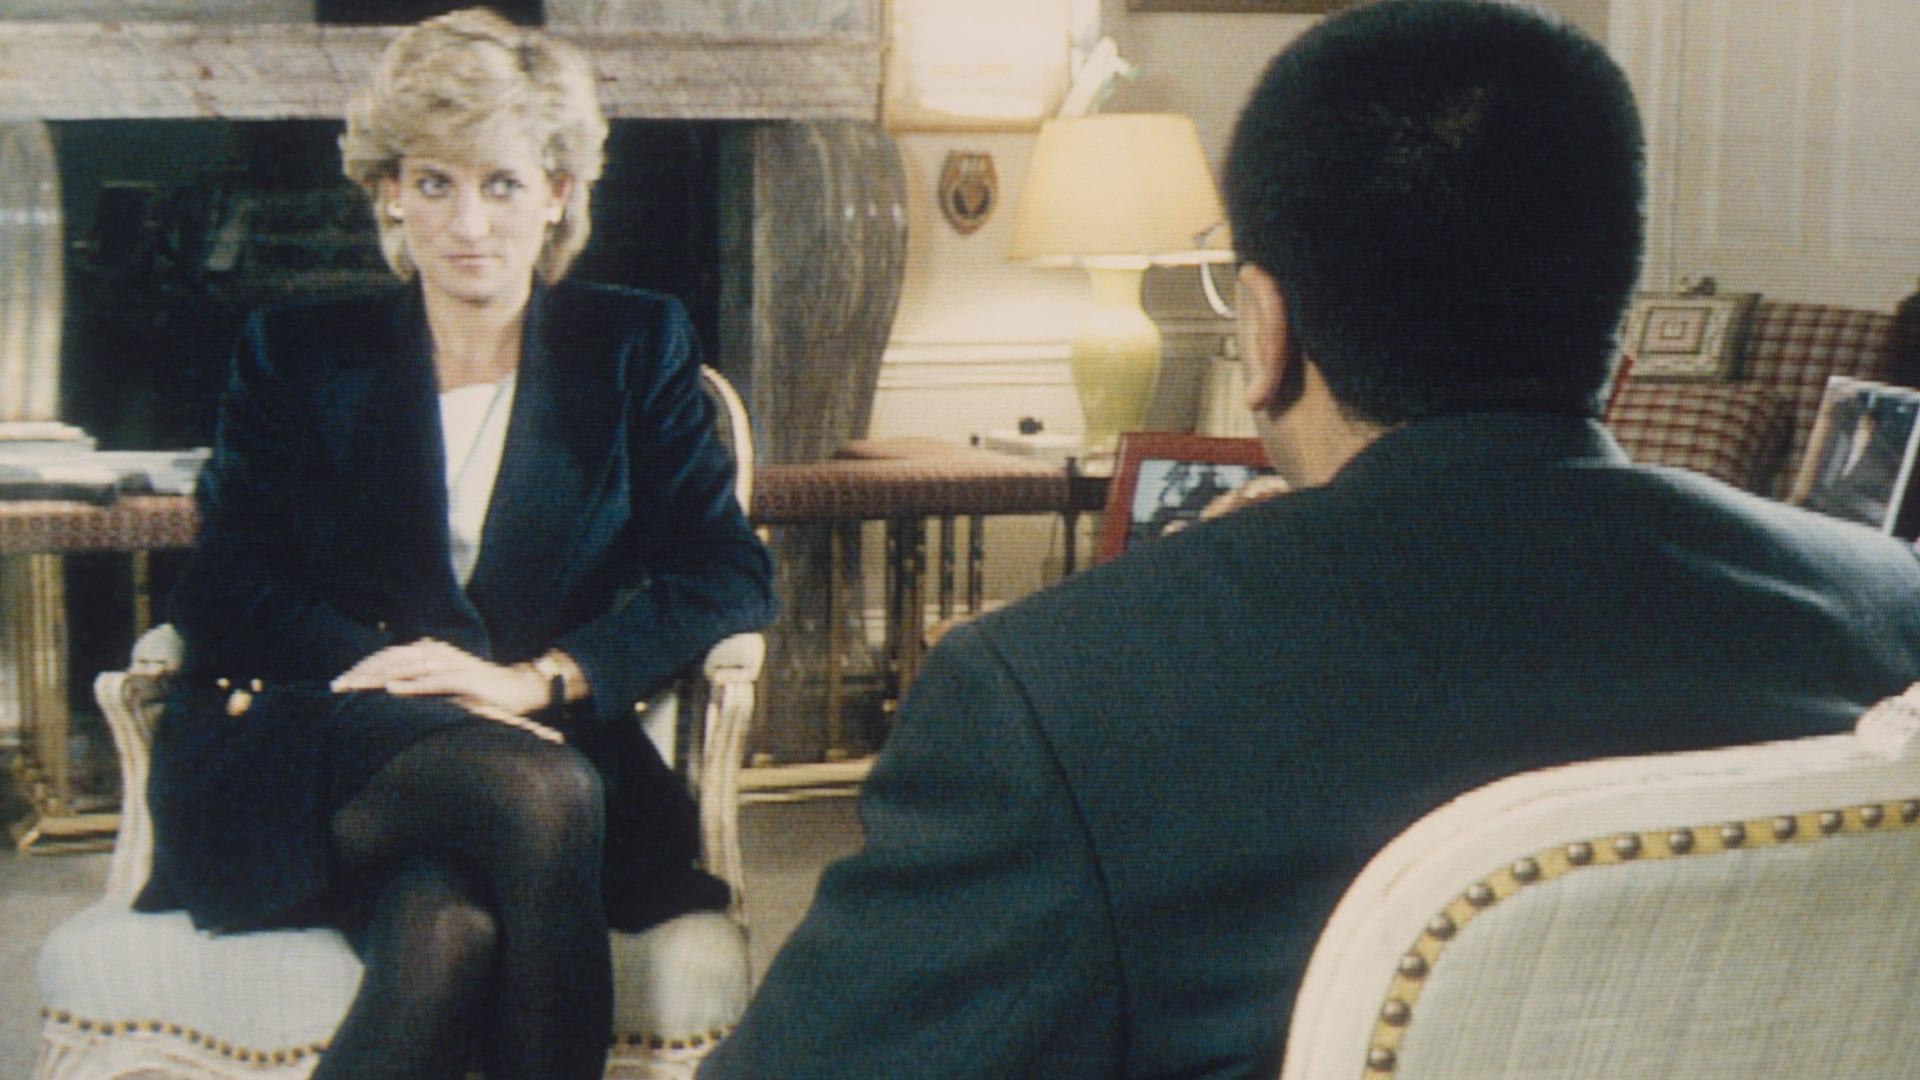 BBC تعتذر لاستخدامها أساليب خادعة في تأمين مقابلة الأميرة ديانا عام 1995